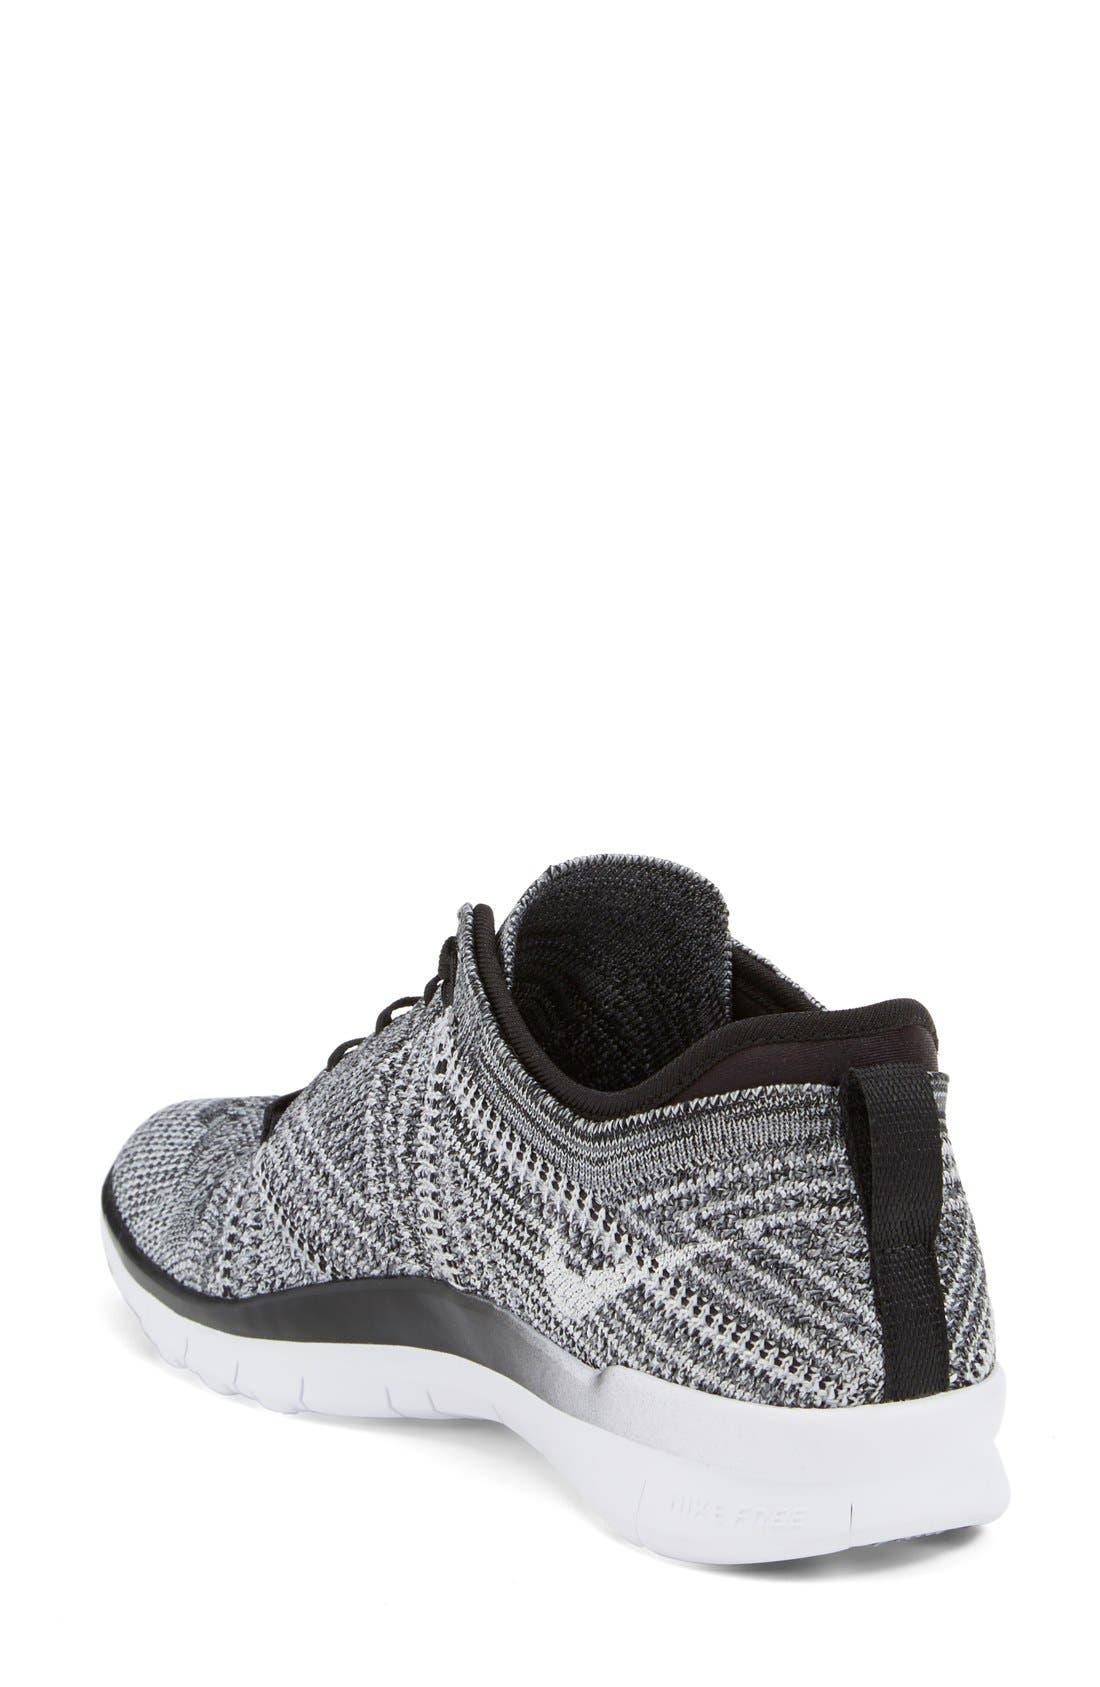 'Free Flyknit 5.0 TR' Training Shoe,                             Alternate thumbnail 2, color,                             Black/ Grey/ White